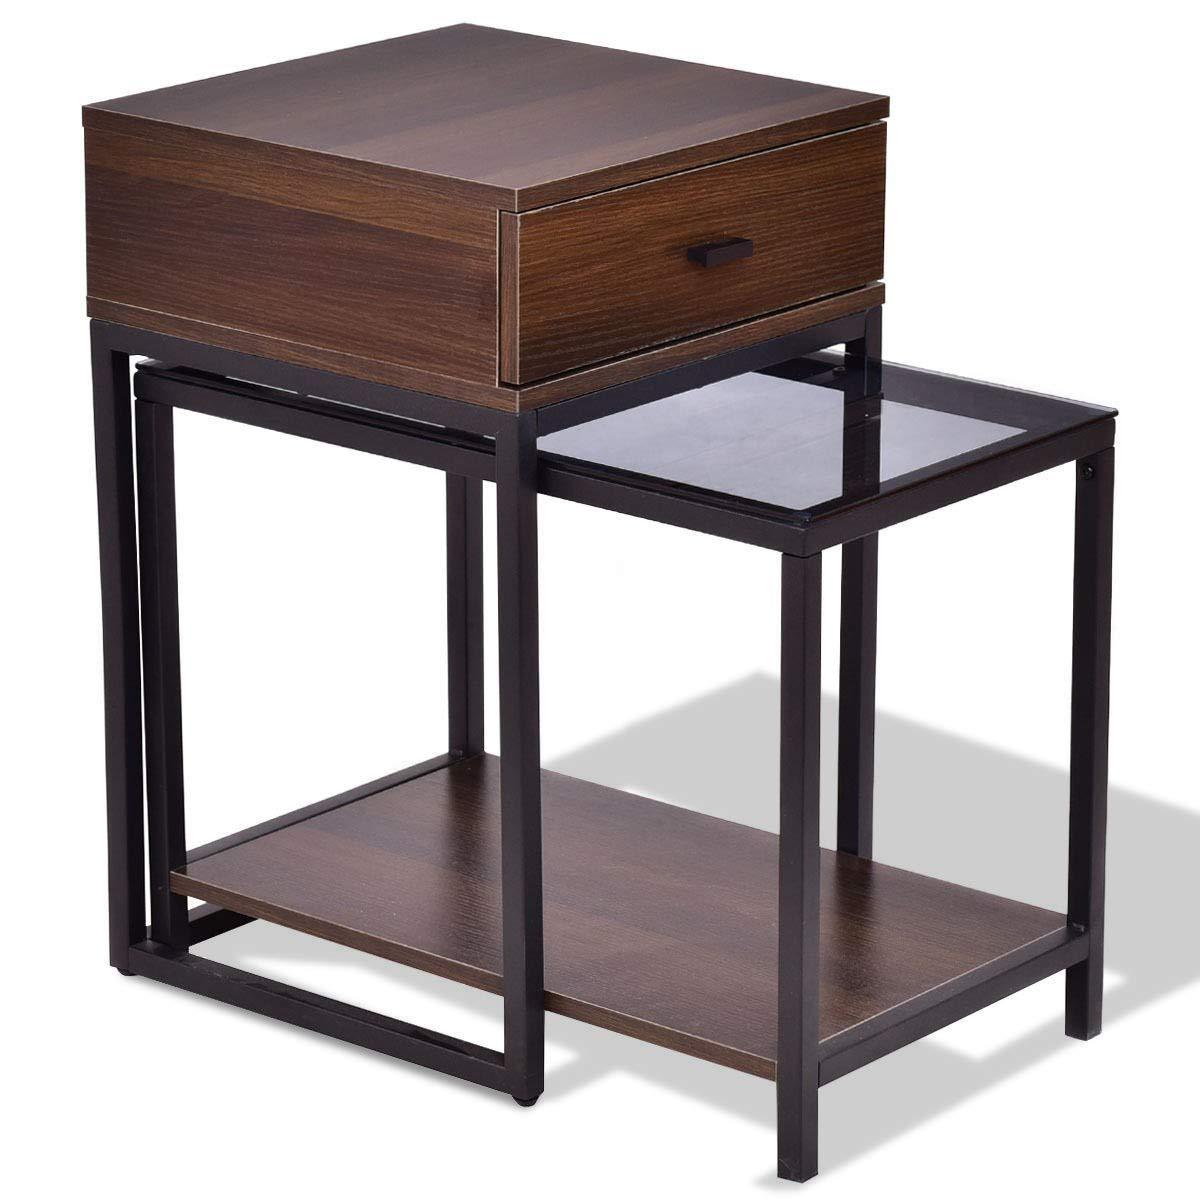 2 pcs Metal Frame Wood Glass Top Nesting Side Table